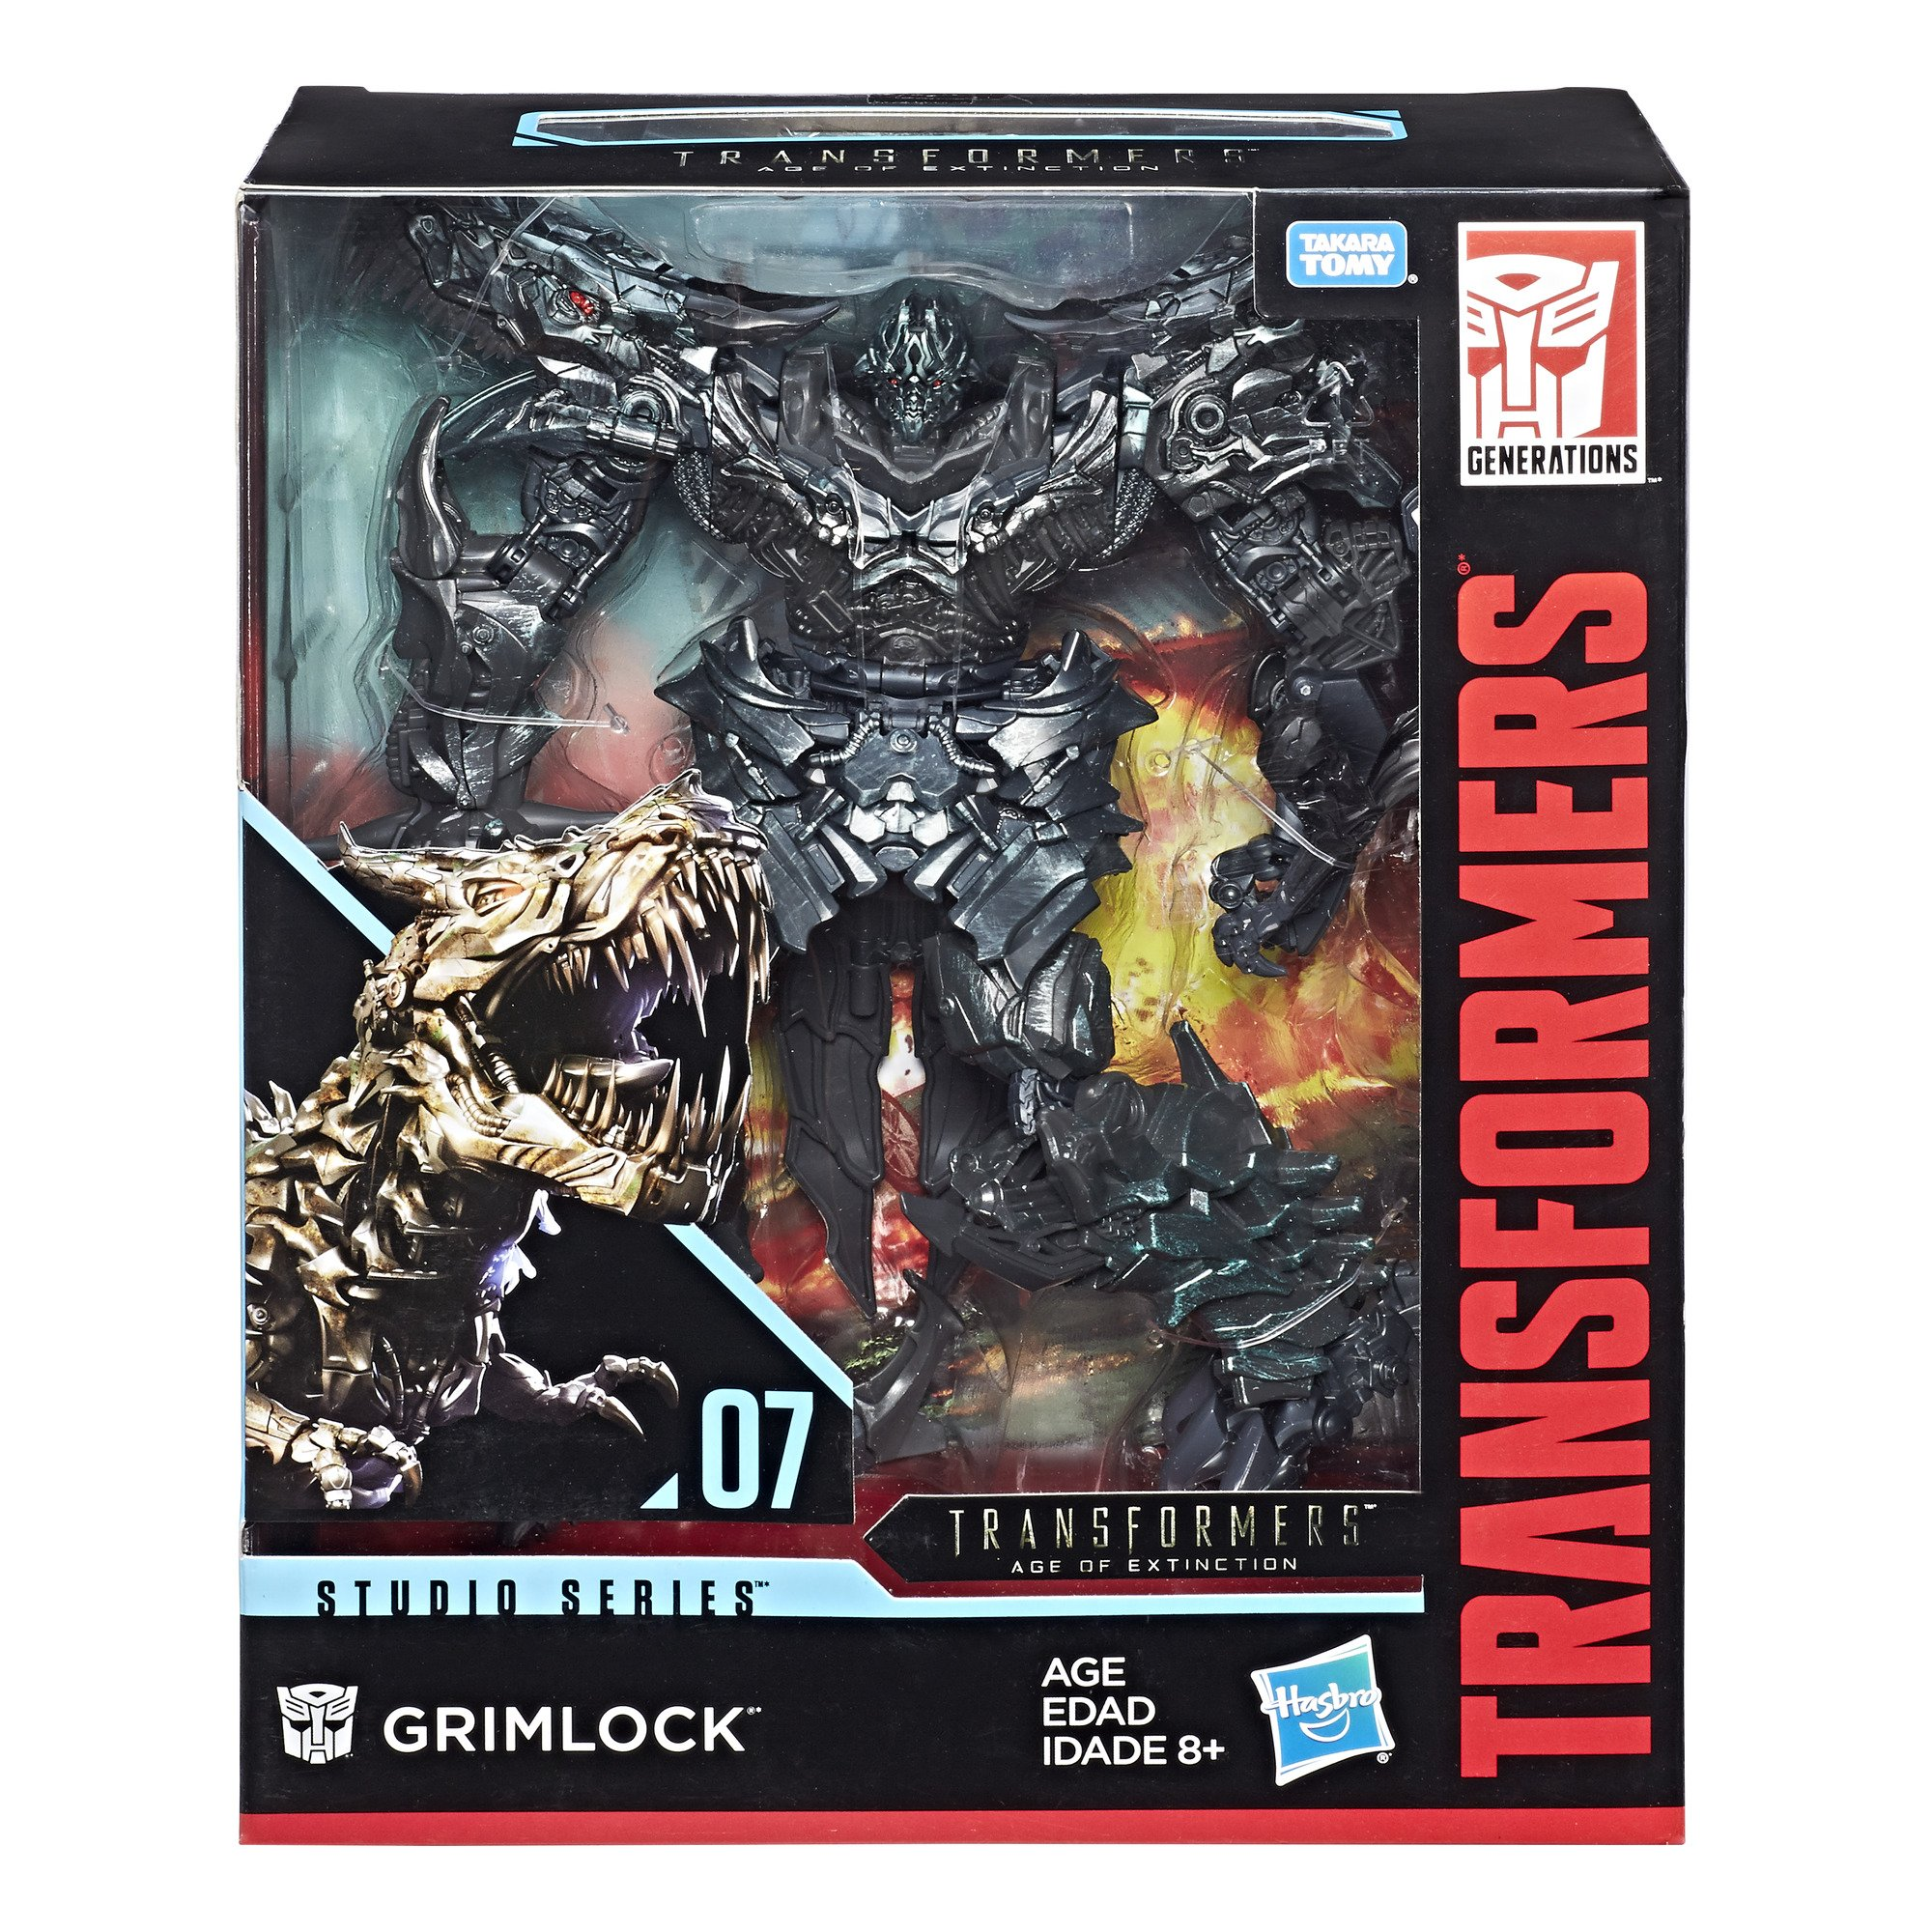 Transformers Studio Series 07 Leader Class Movie 4 Grimlock by Transformers (Image #3)